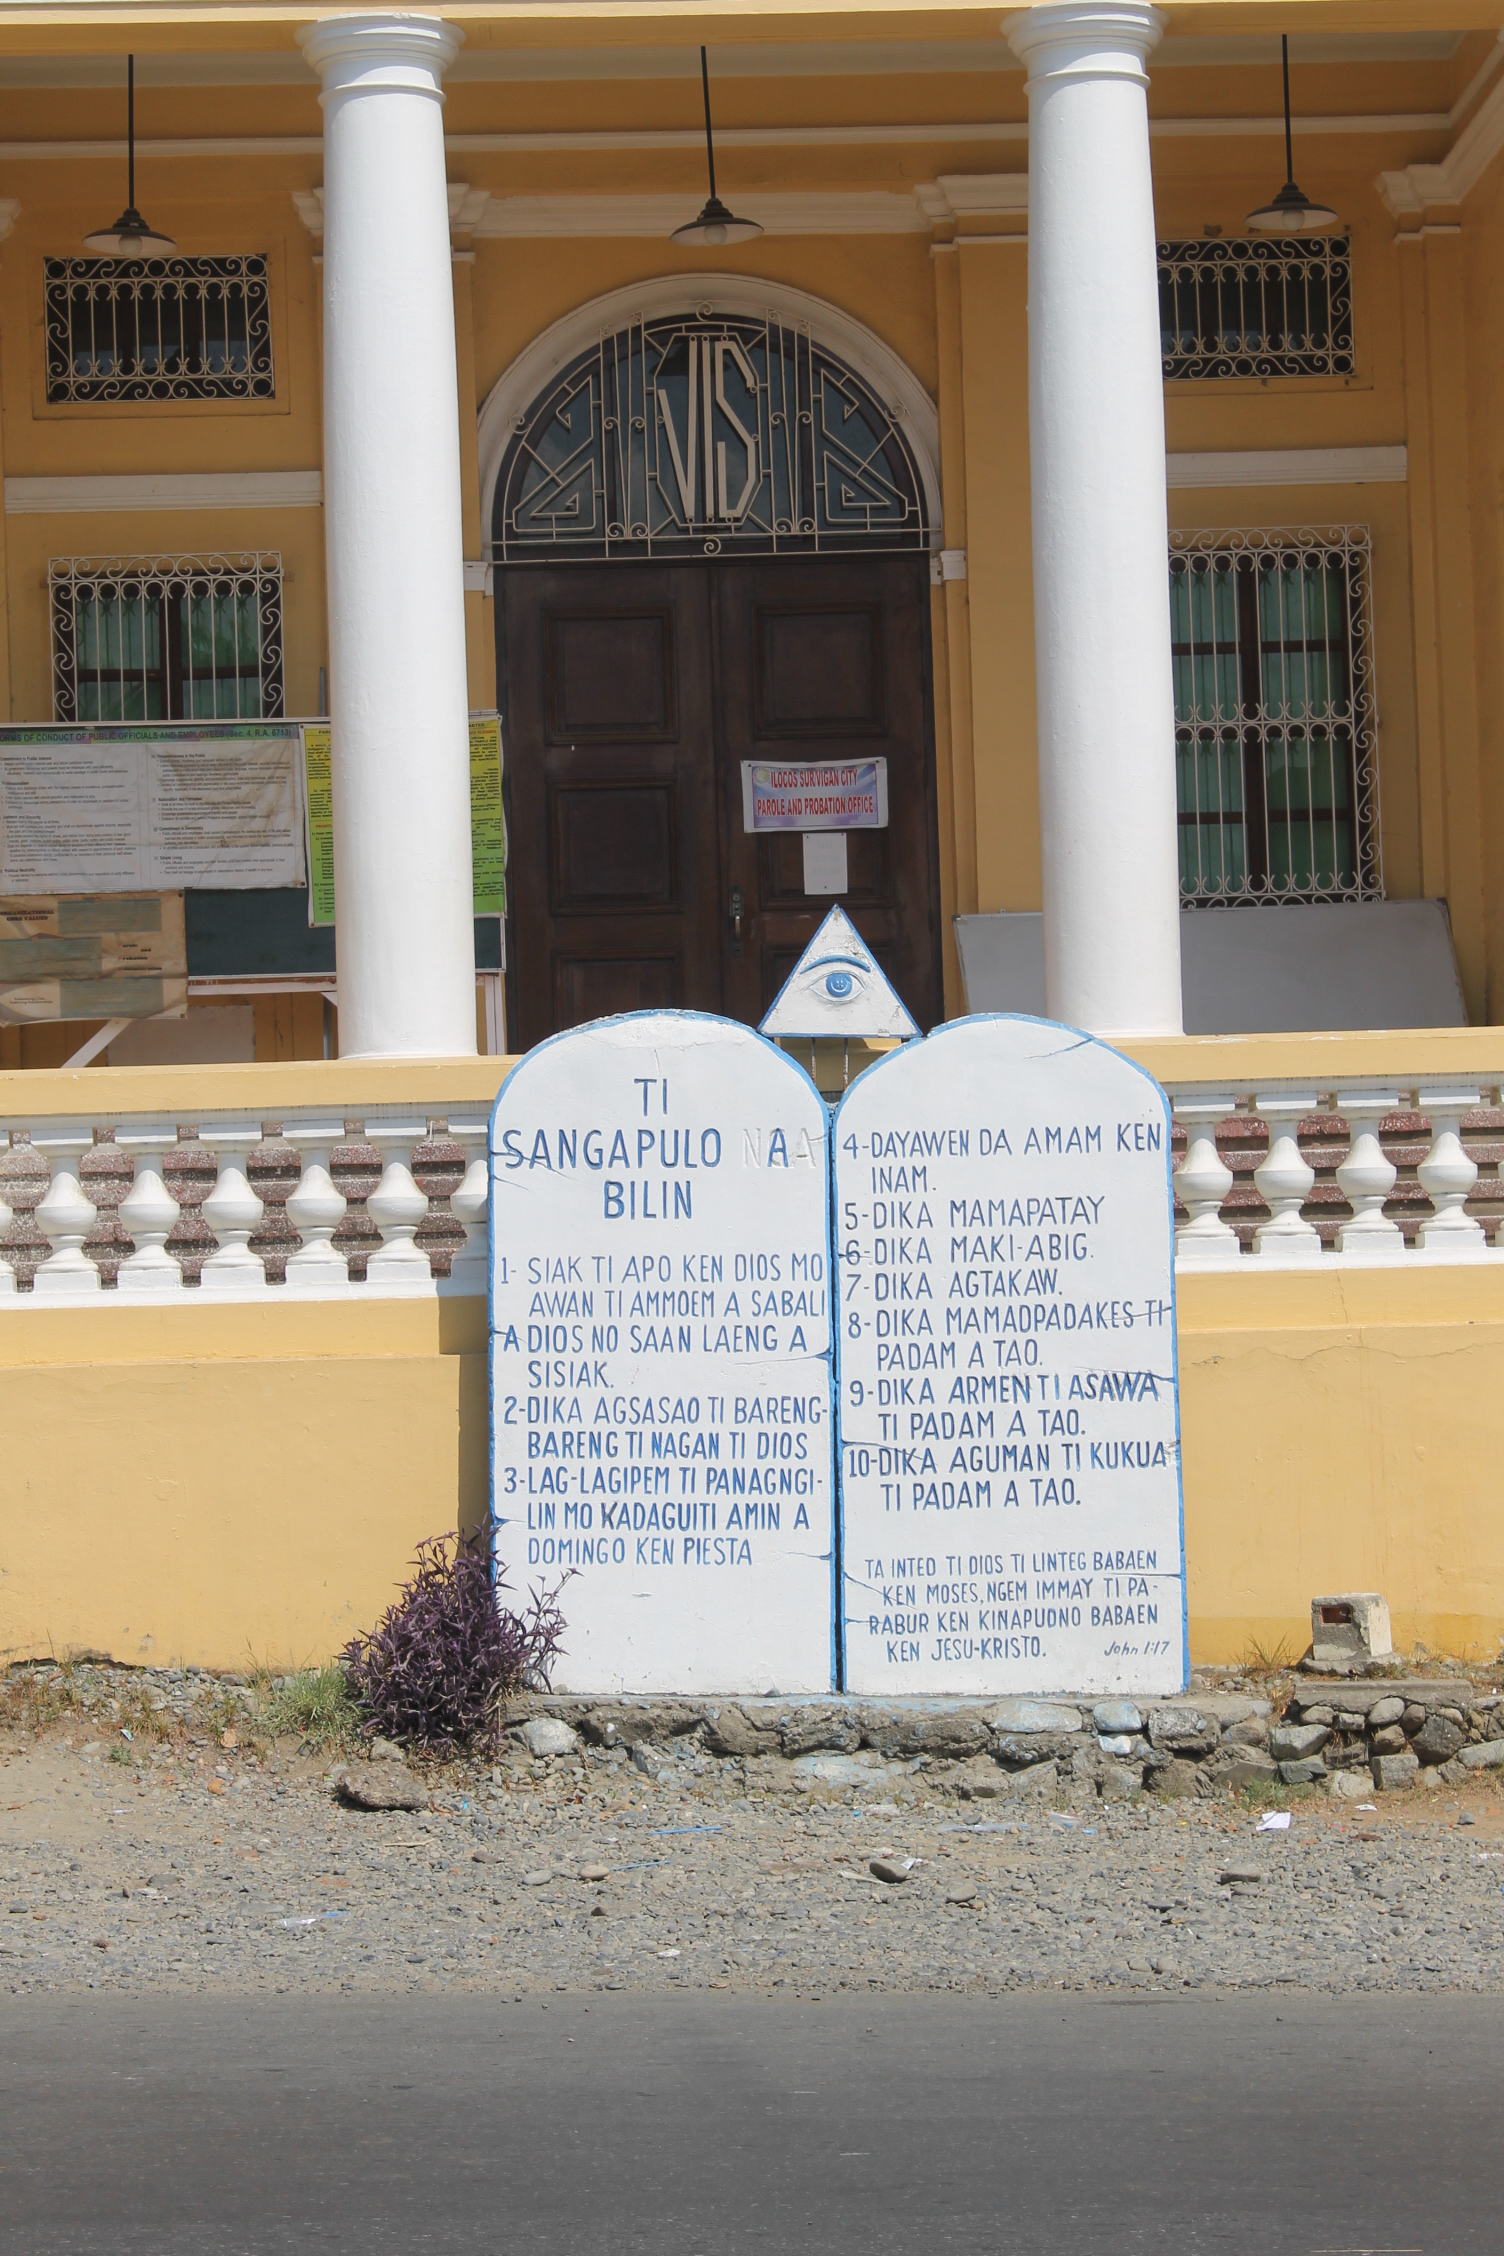 Ilocano Language Wikipedia Sambal Sate Blara By Lindy Ui Literatureedit